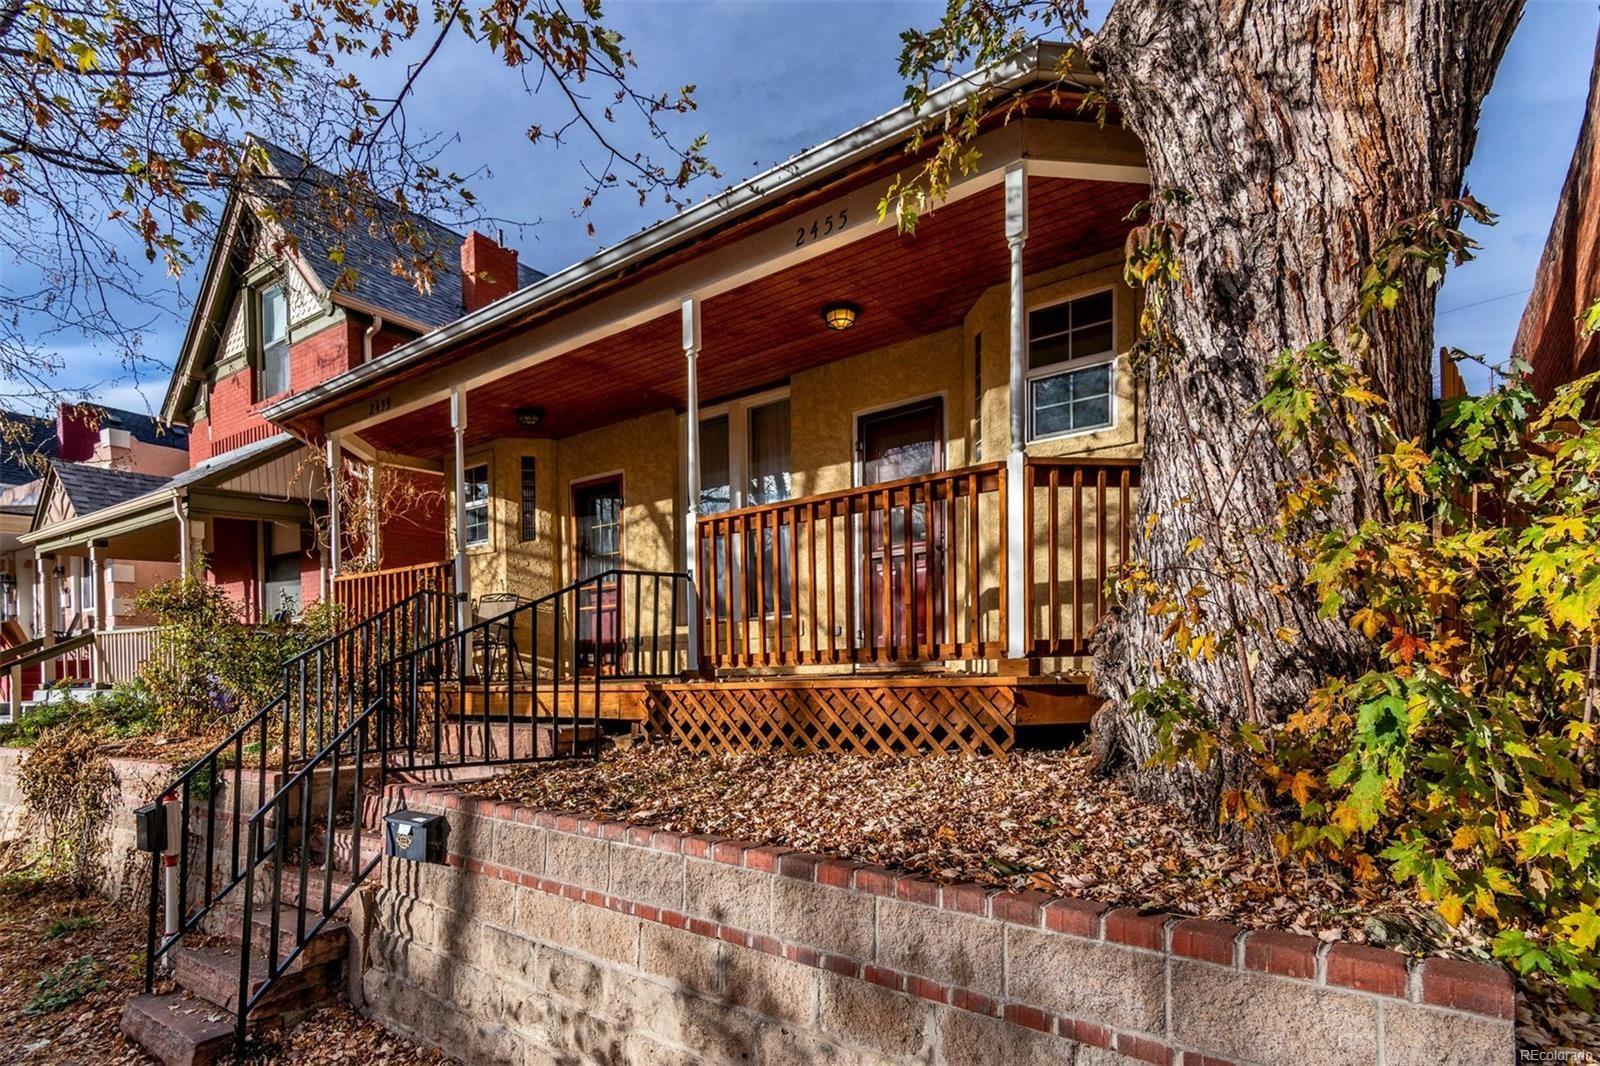 MLS# 6480257 - 1 - 2455  W Caithness Place, Denver, CO 80211